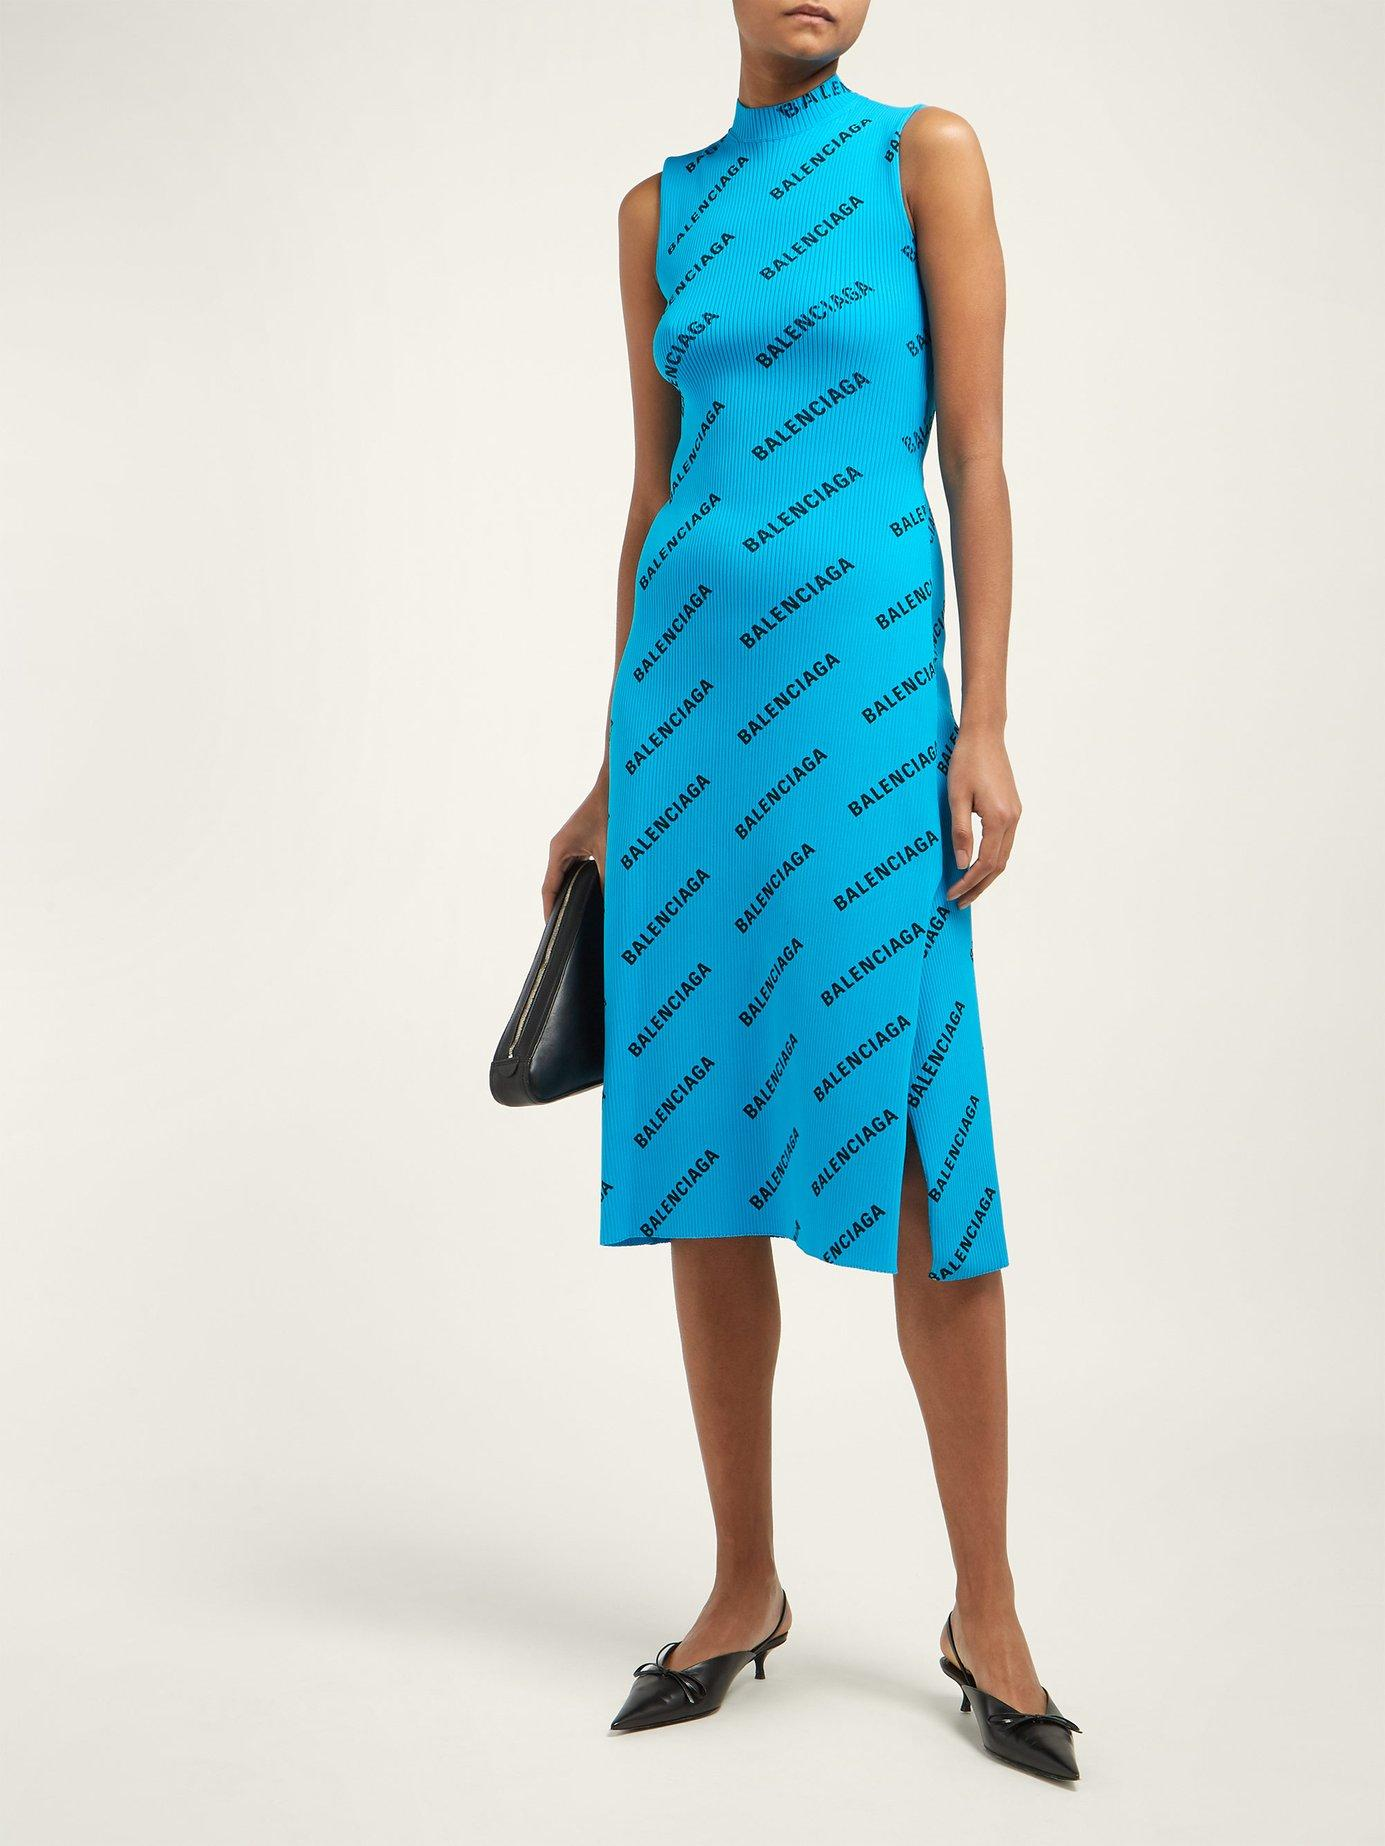 168ca4d5ebcc Balenciaga Logo Print Ribbed Wrap Midi Dress in Blue - Save 50% - Lyst